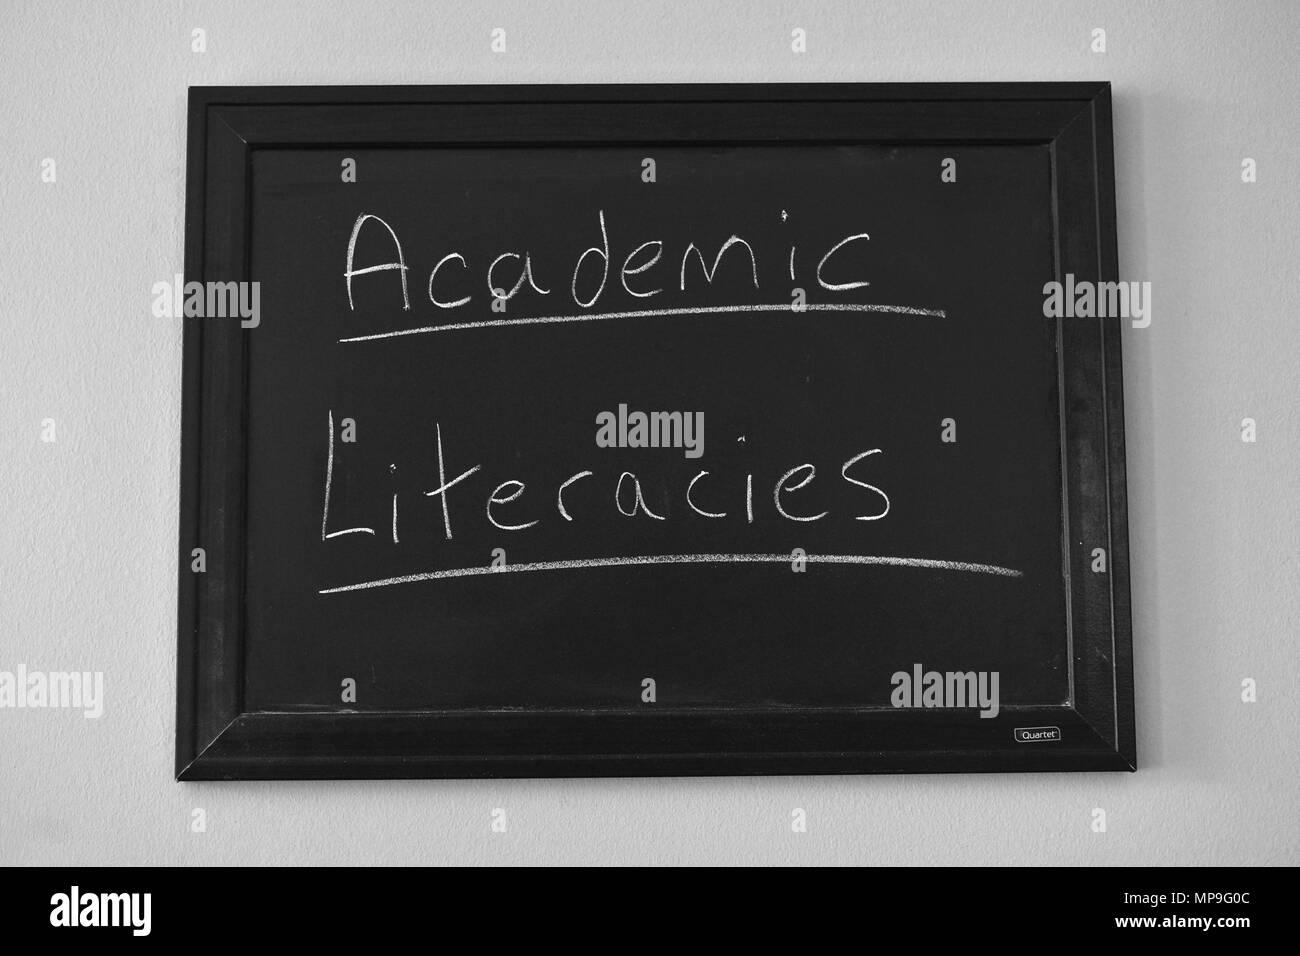 Academic Literacies written in white chalk on a wall mounted blackboard. - Stock Image